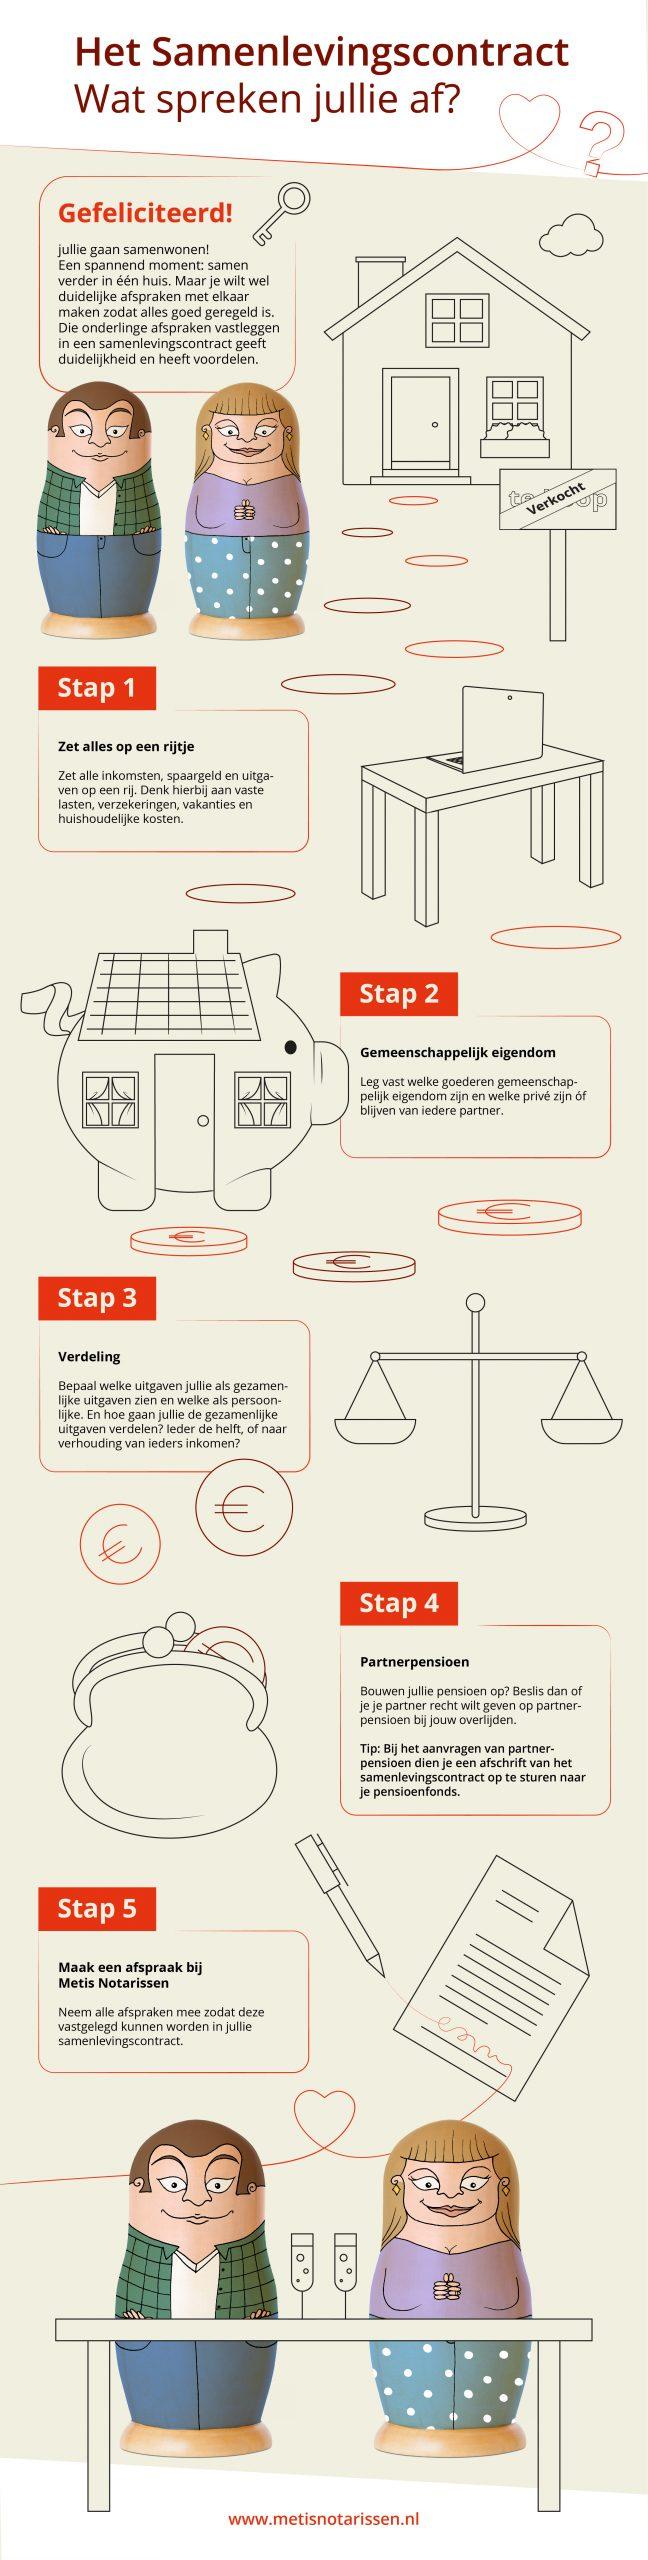 5 stappen samenlevingscontract